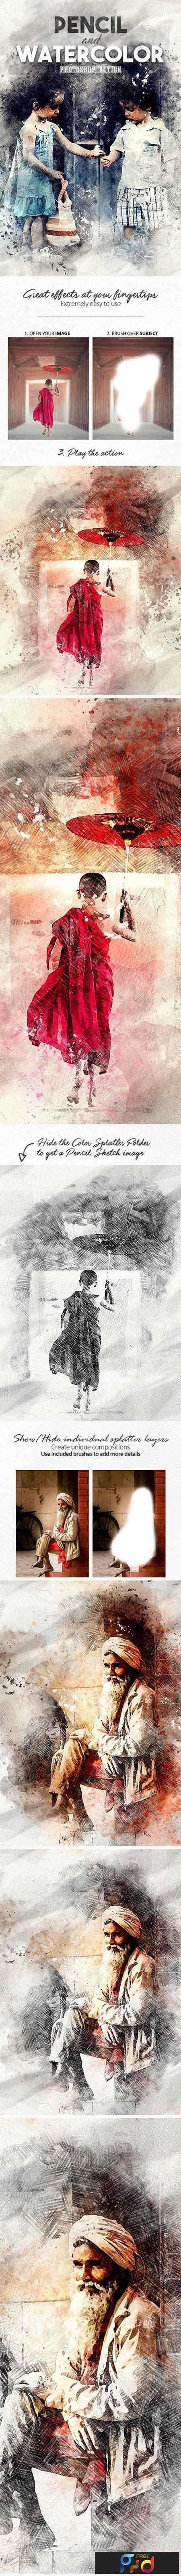 1808005 Pencil n Watercolor Photoshop Action 19586973